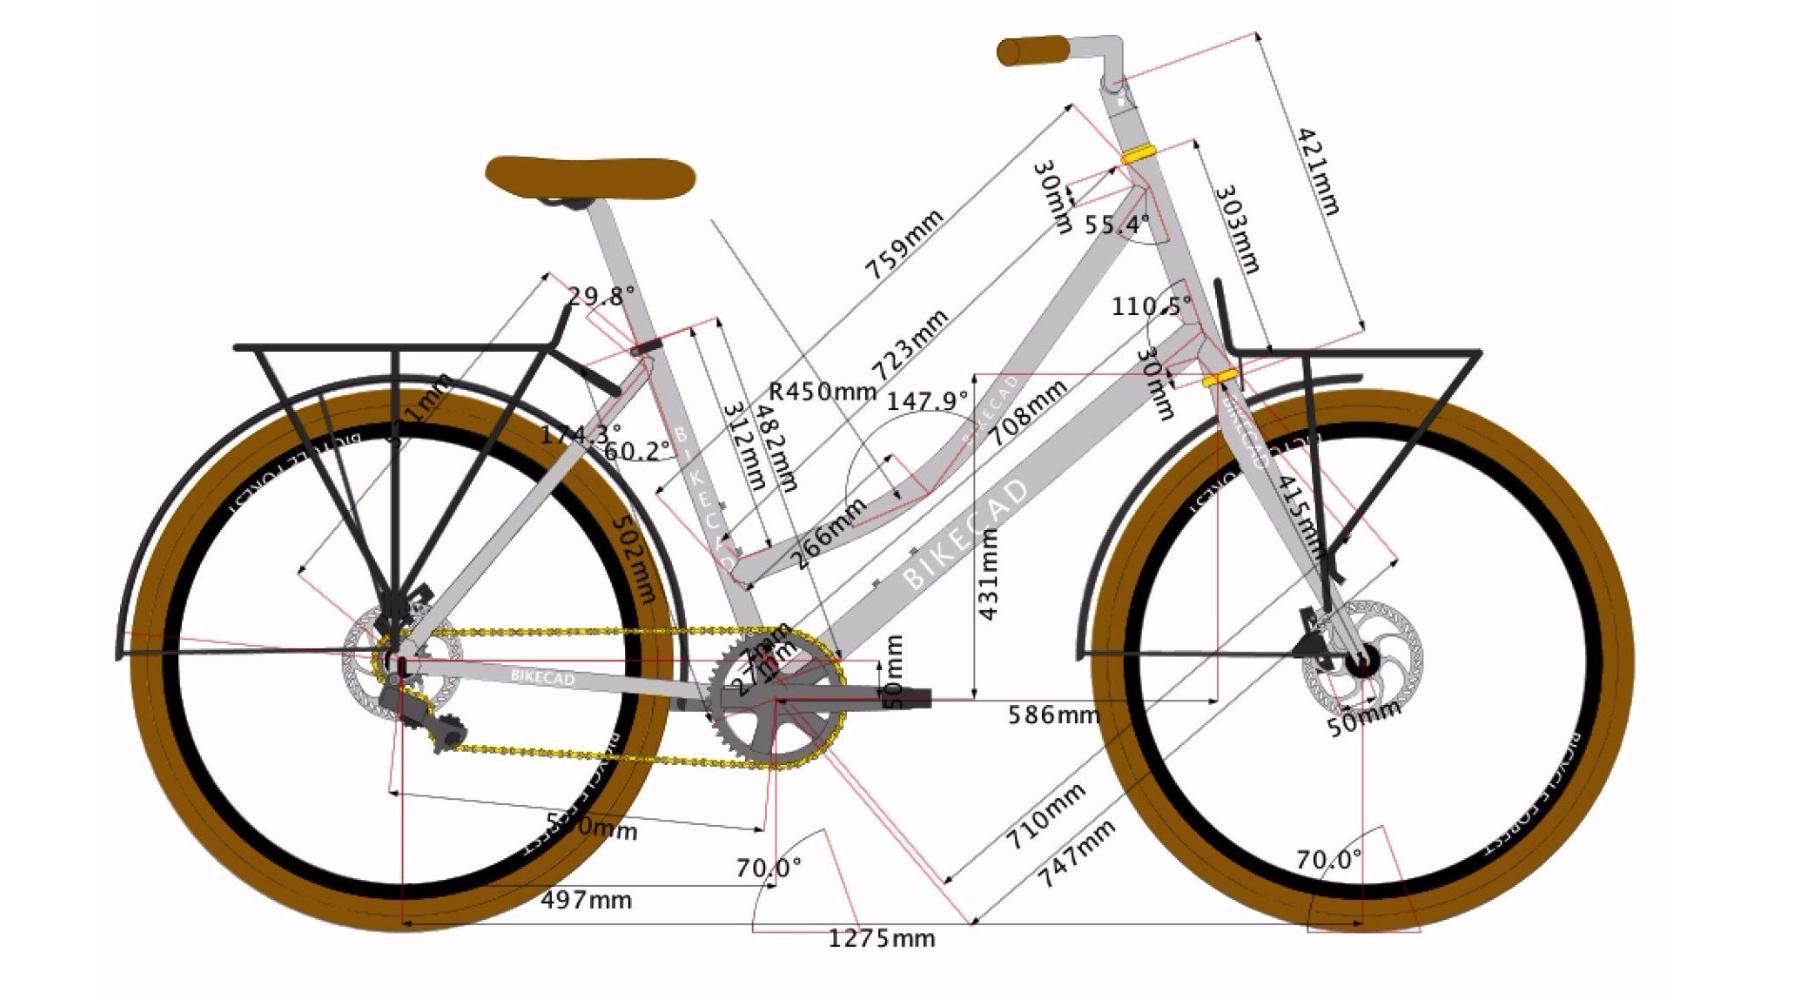 HANDMADE TITANIUM BICYCLES